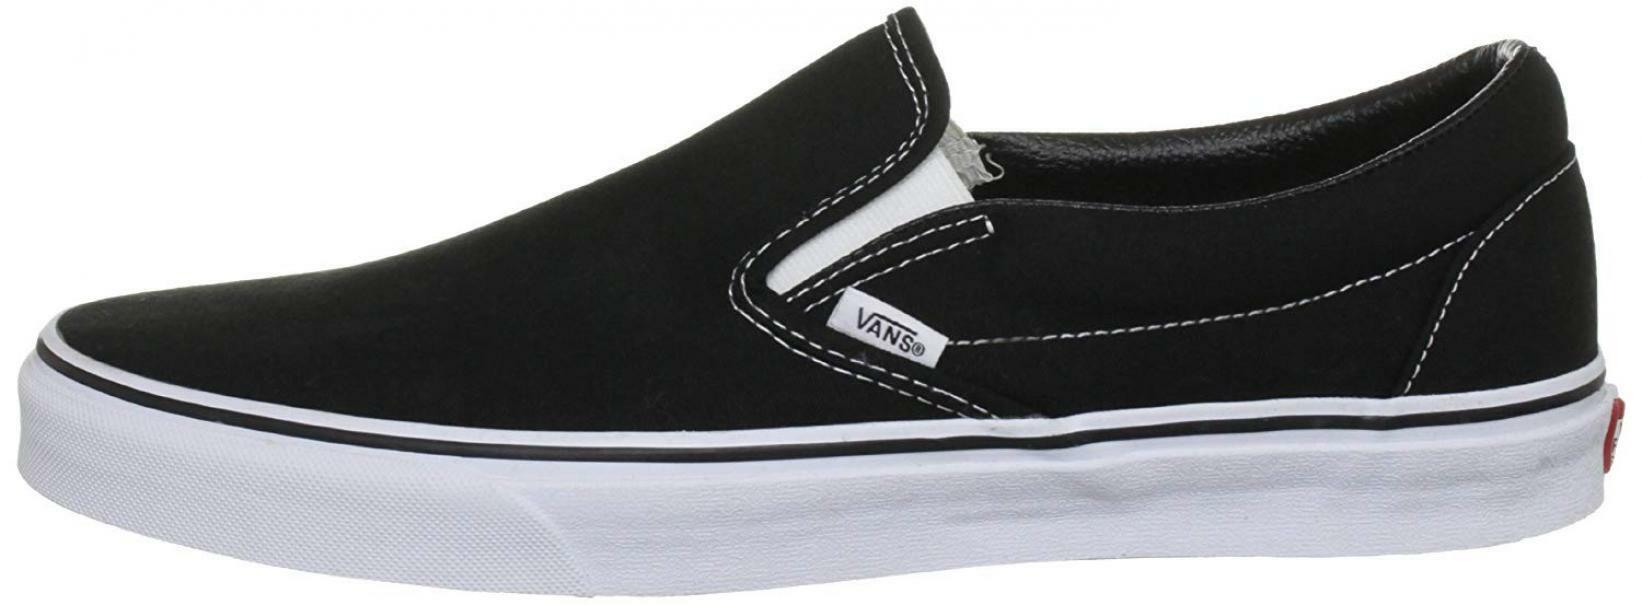 Vans classic slip on scarpe sportive uomo nere vn000eyeblk